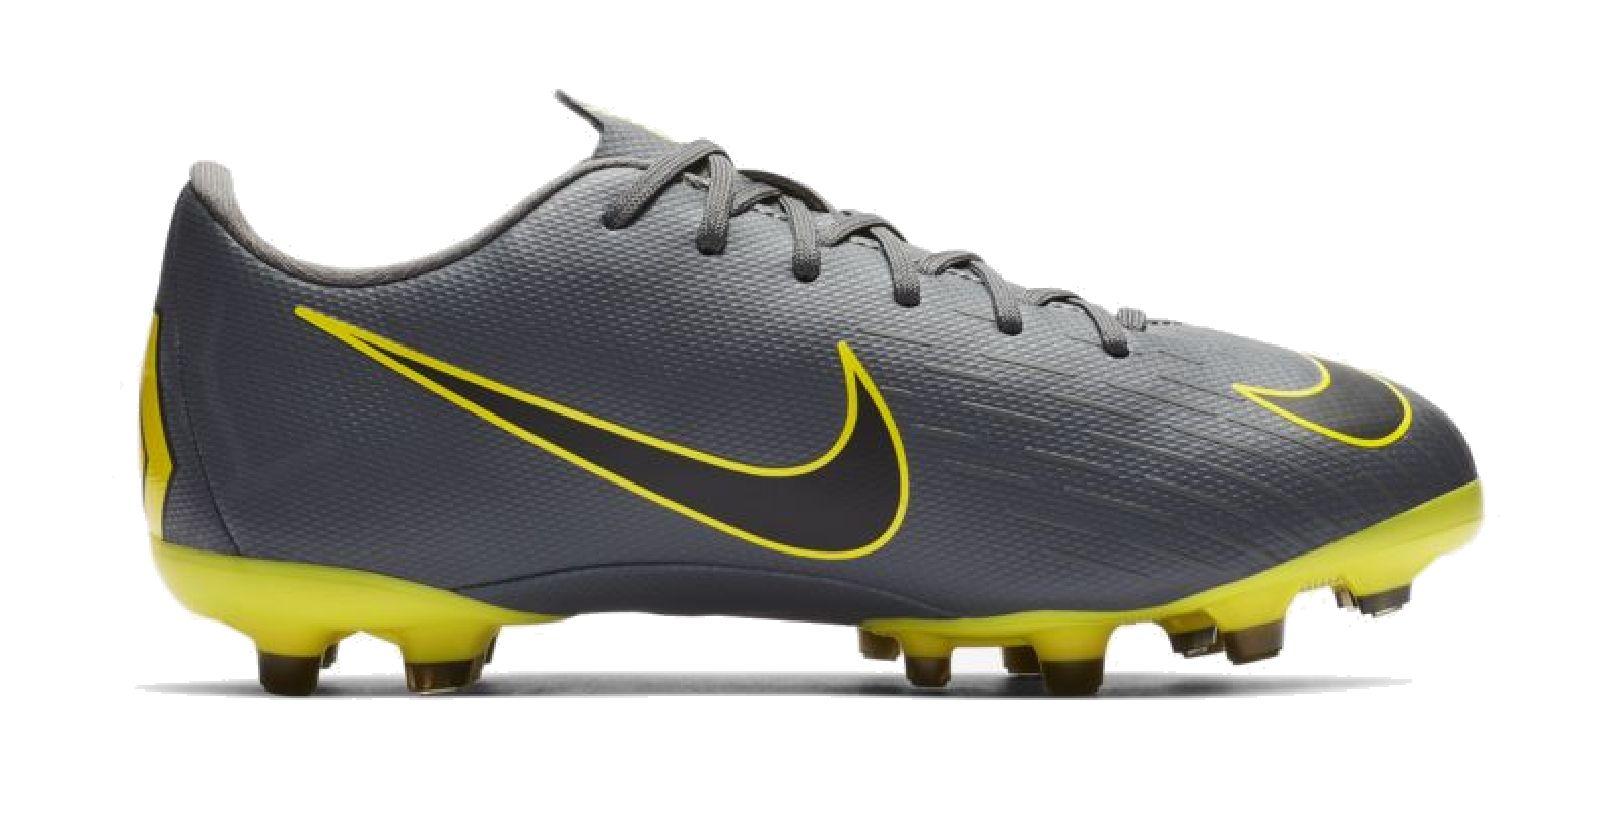 sale best price best deals on Details zu Nike Kinder Fußballschuhe NockenschuhE Vapor 12 Academy MG grau  gelb AH7347 070